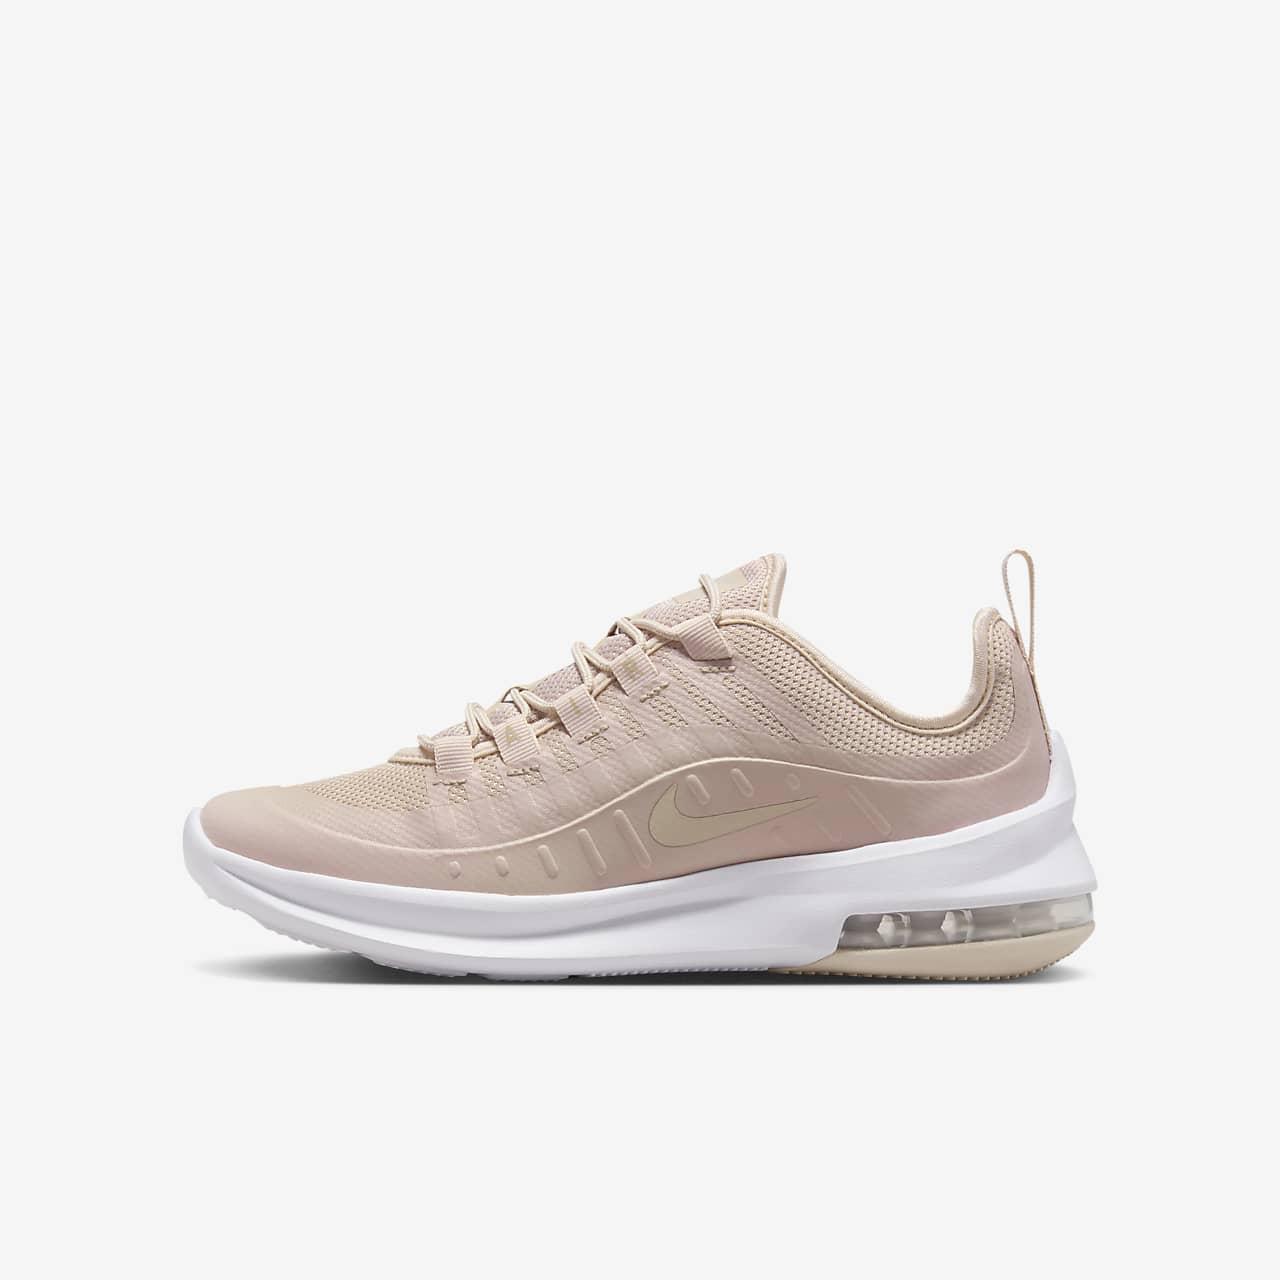 hot sale online c0d8c c0969 ... Nike Air Max Axis SE-sko til store børn